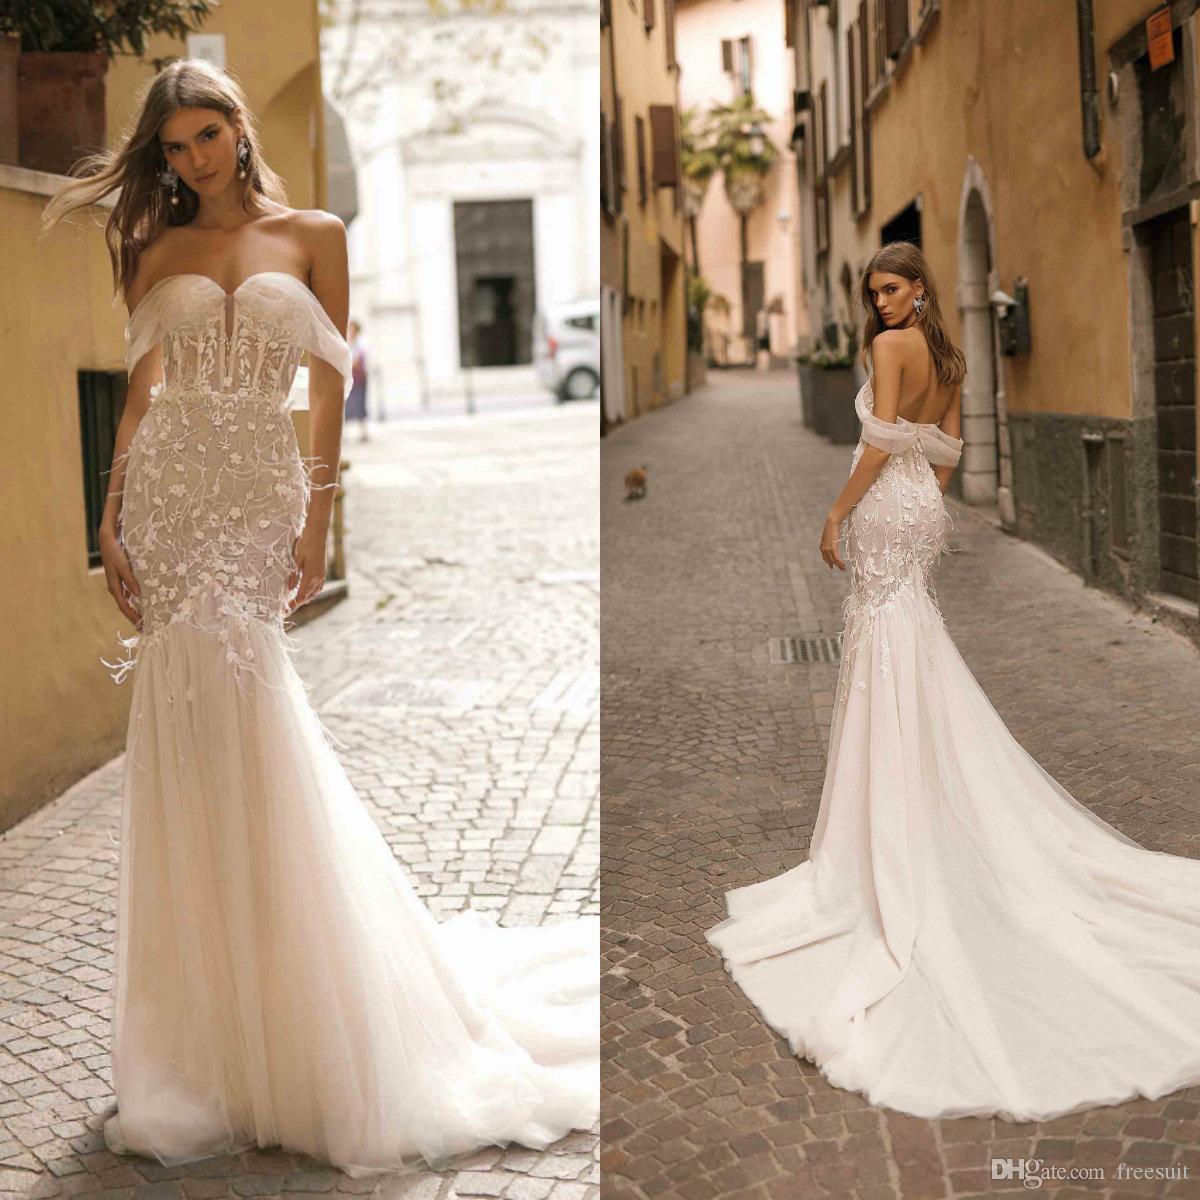 Berta Mermaid Wedding Vestidos Alças 3D Floral Appliqued Feather Ruffle Backless Illusion vestidos de noiva Custom Made Vestidos de novia